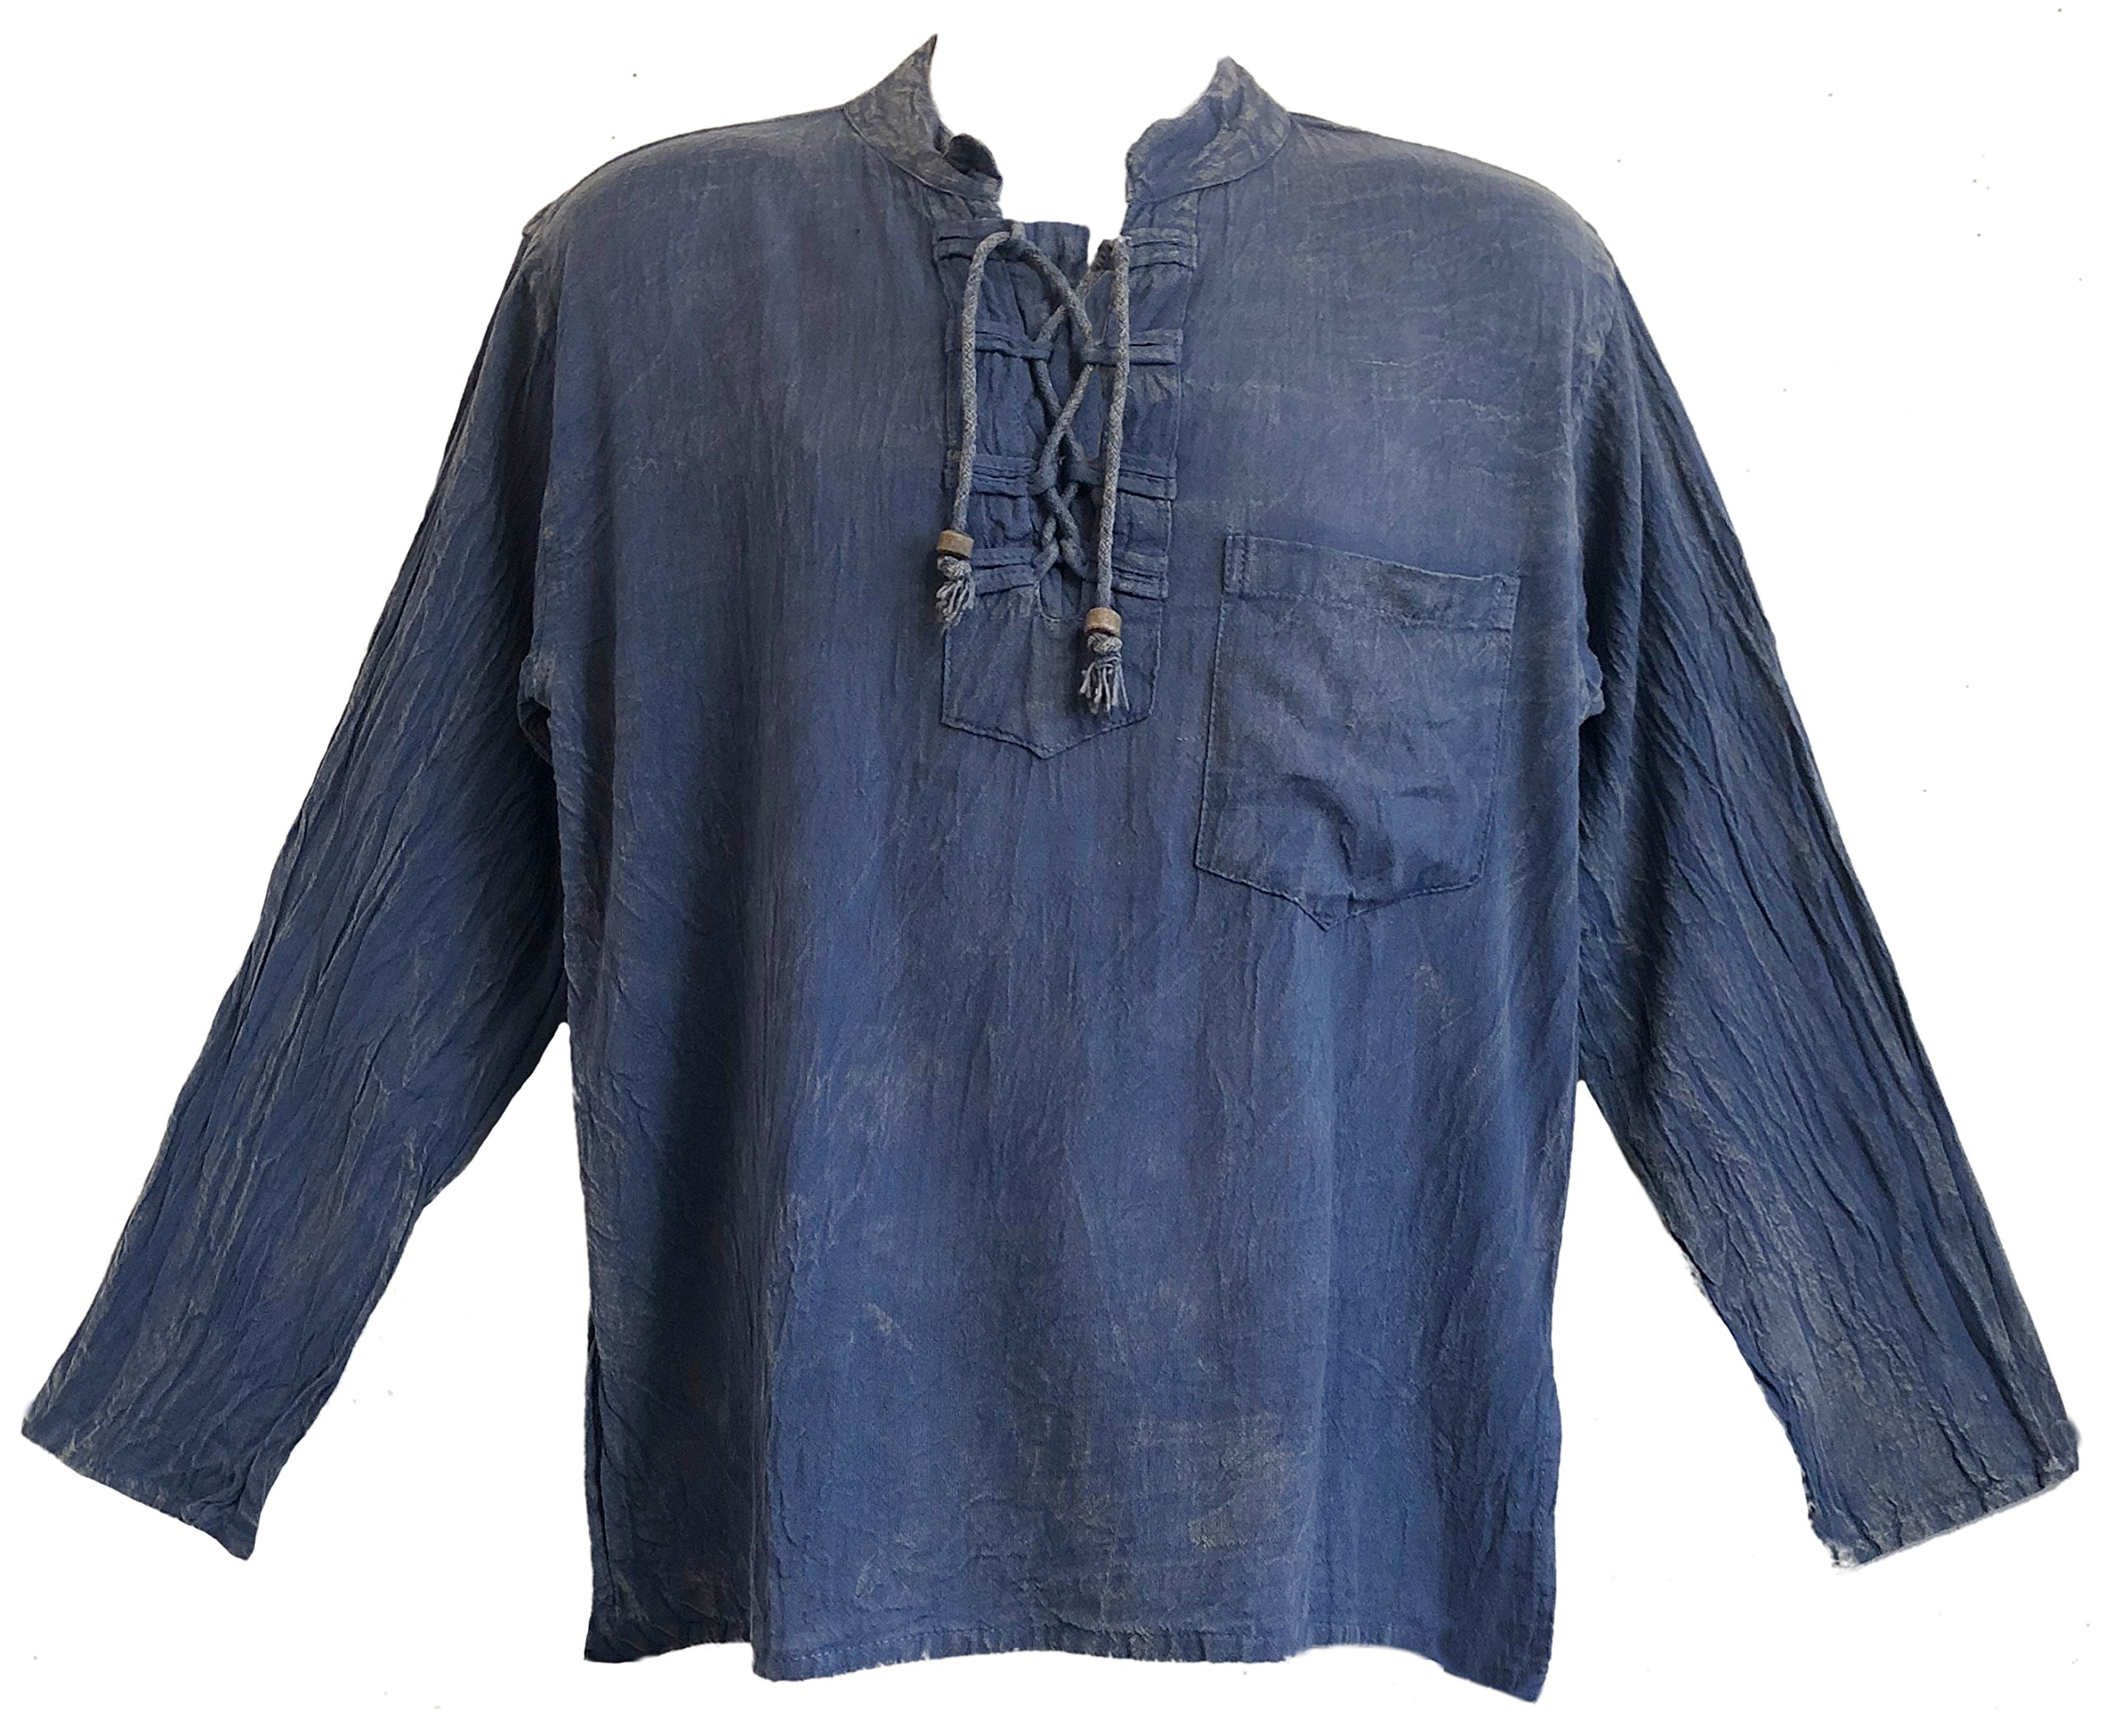 Yak & Yeti Men's Kurta Stone Washed Lightweight Cotton Embroidered Mandarin Style Collar (Medium, Blue Lace up)